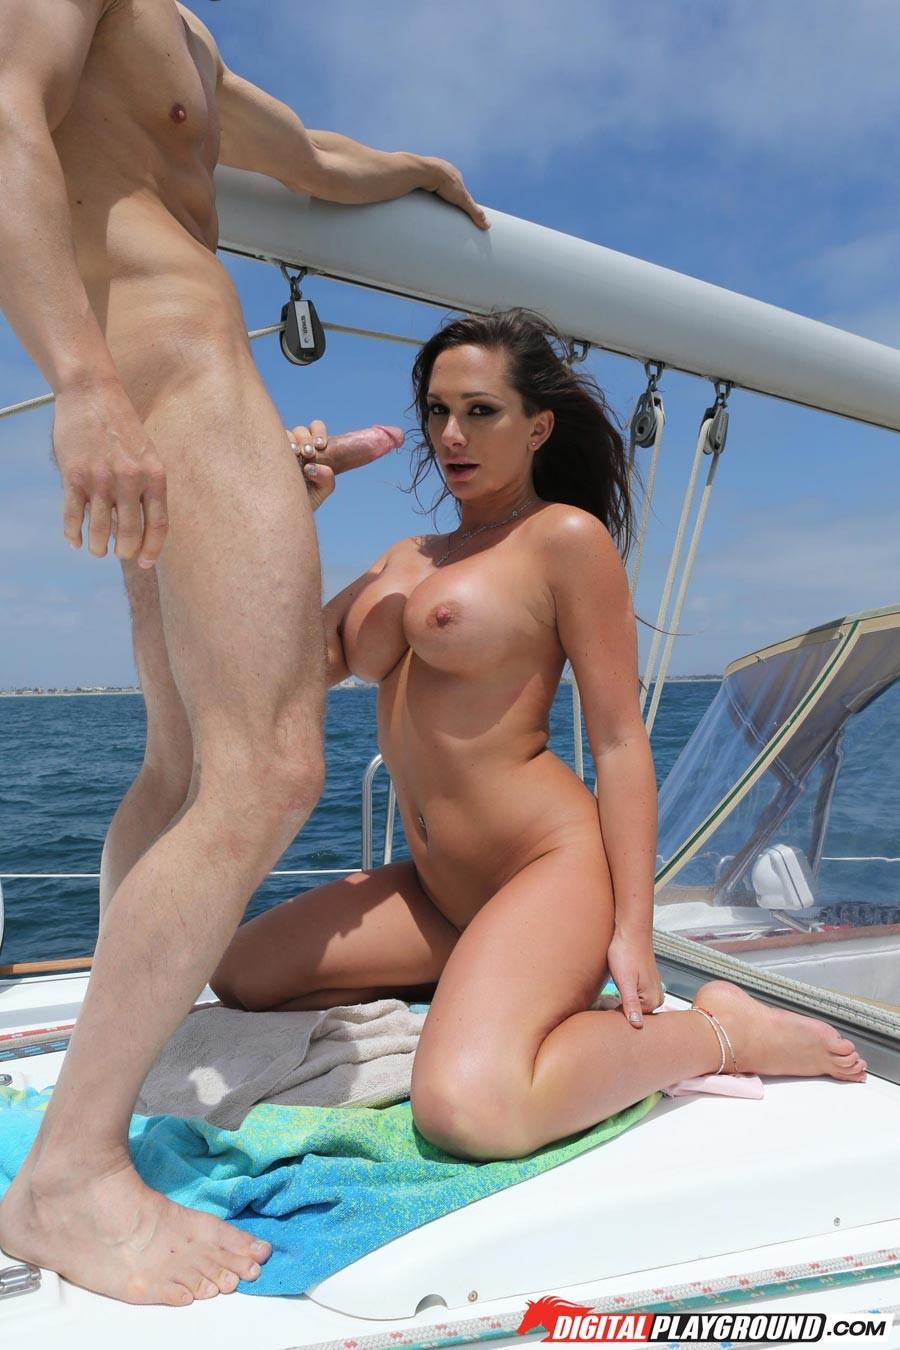 организм секс с машей на яхте описал